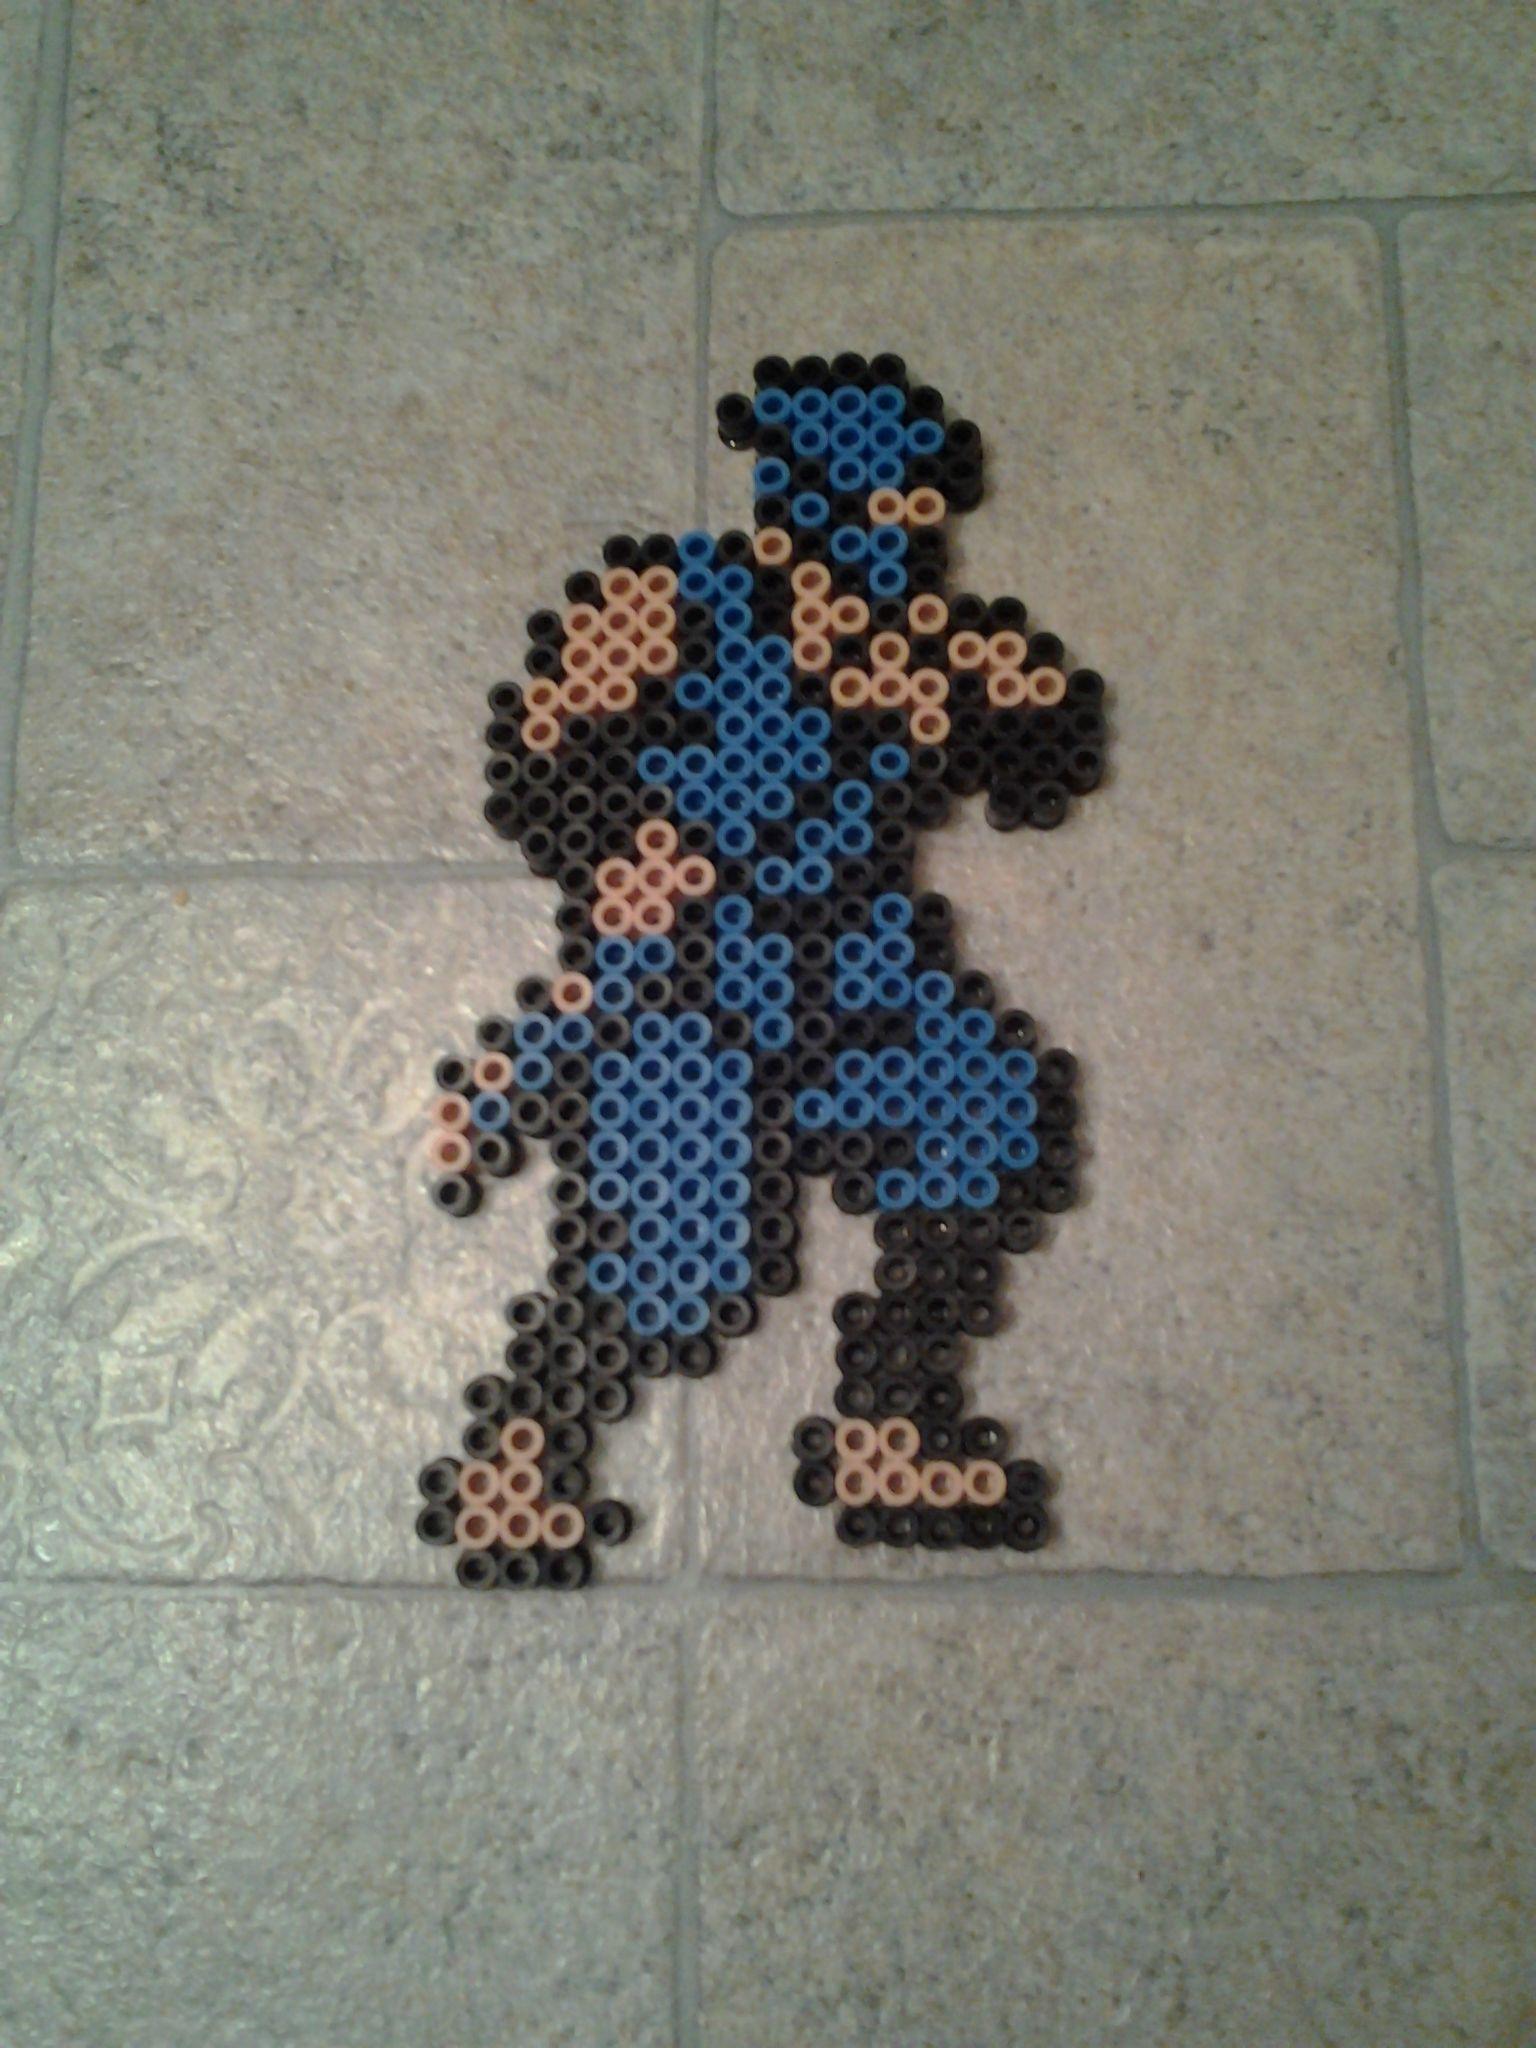 Ninja Gaiden Perler Bead Art Sam. Beads